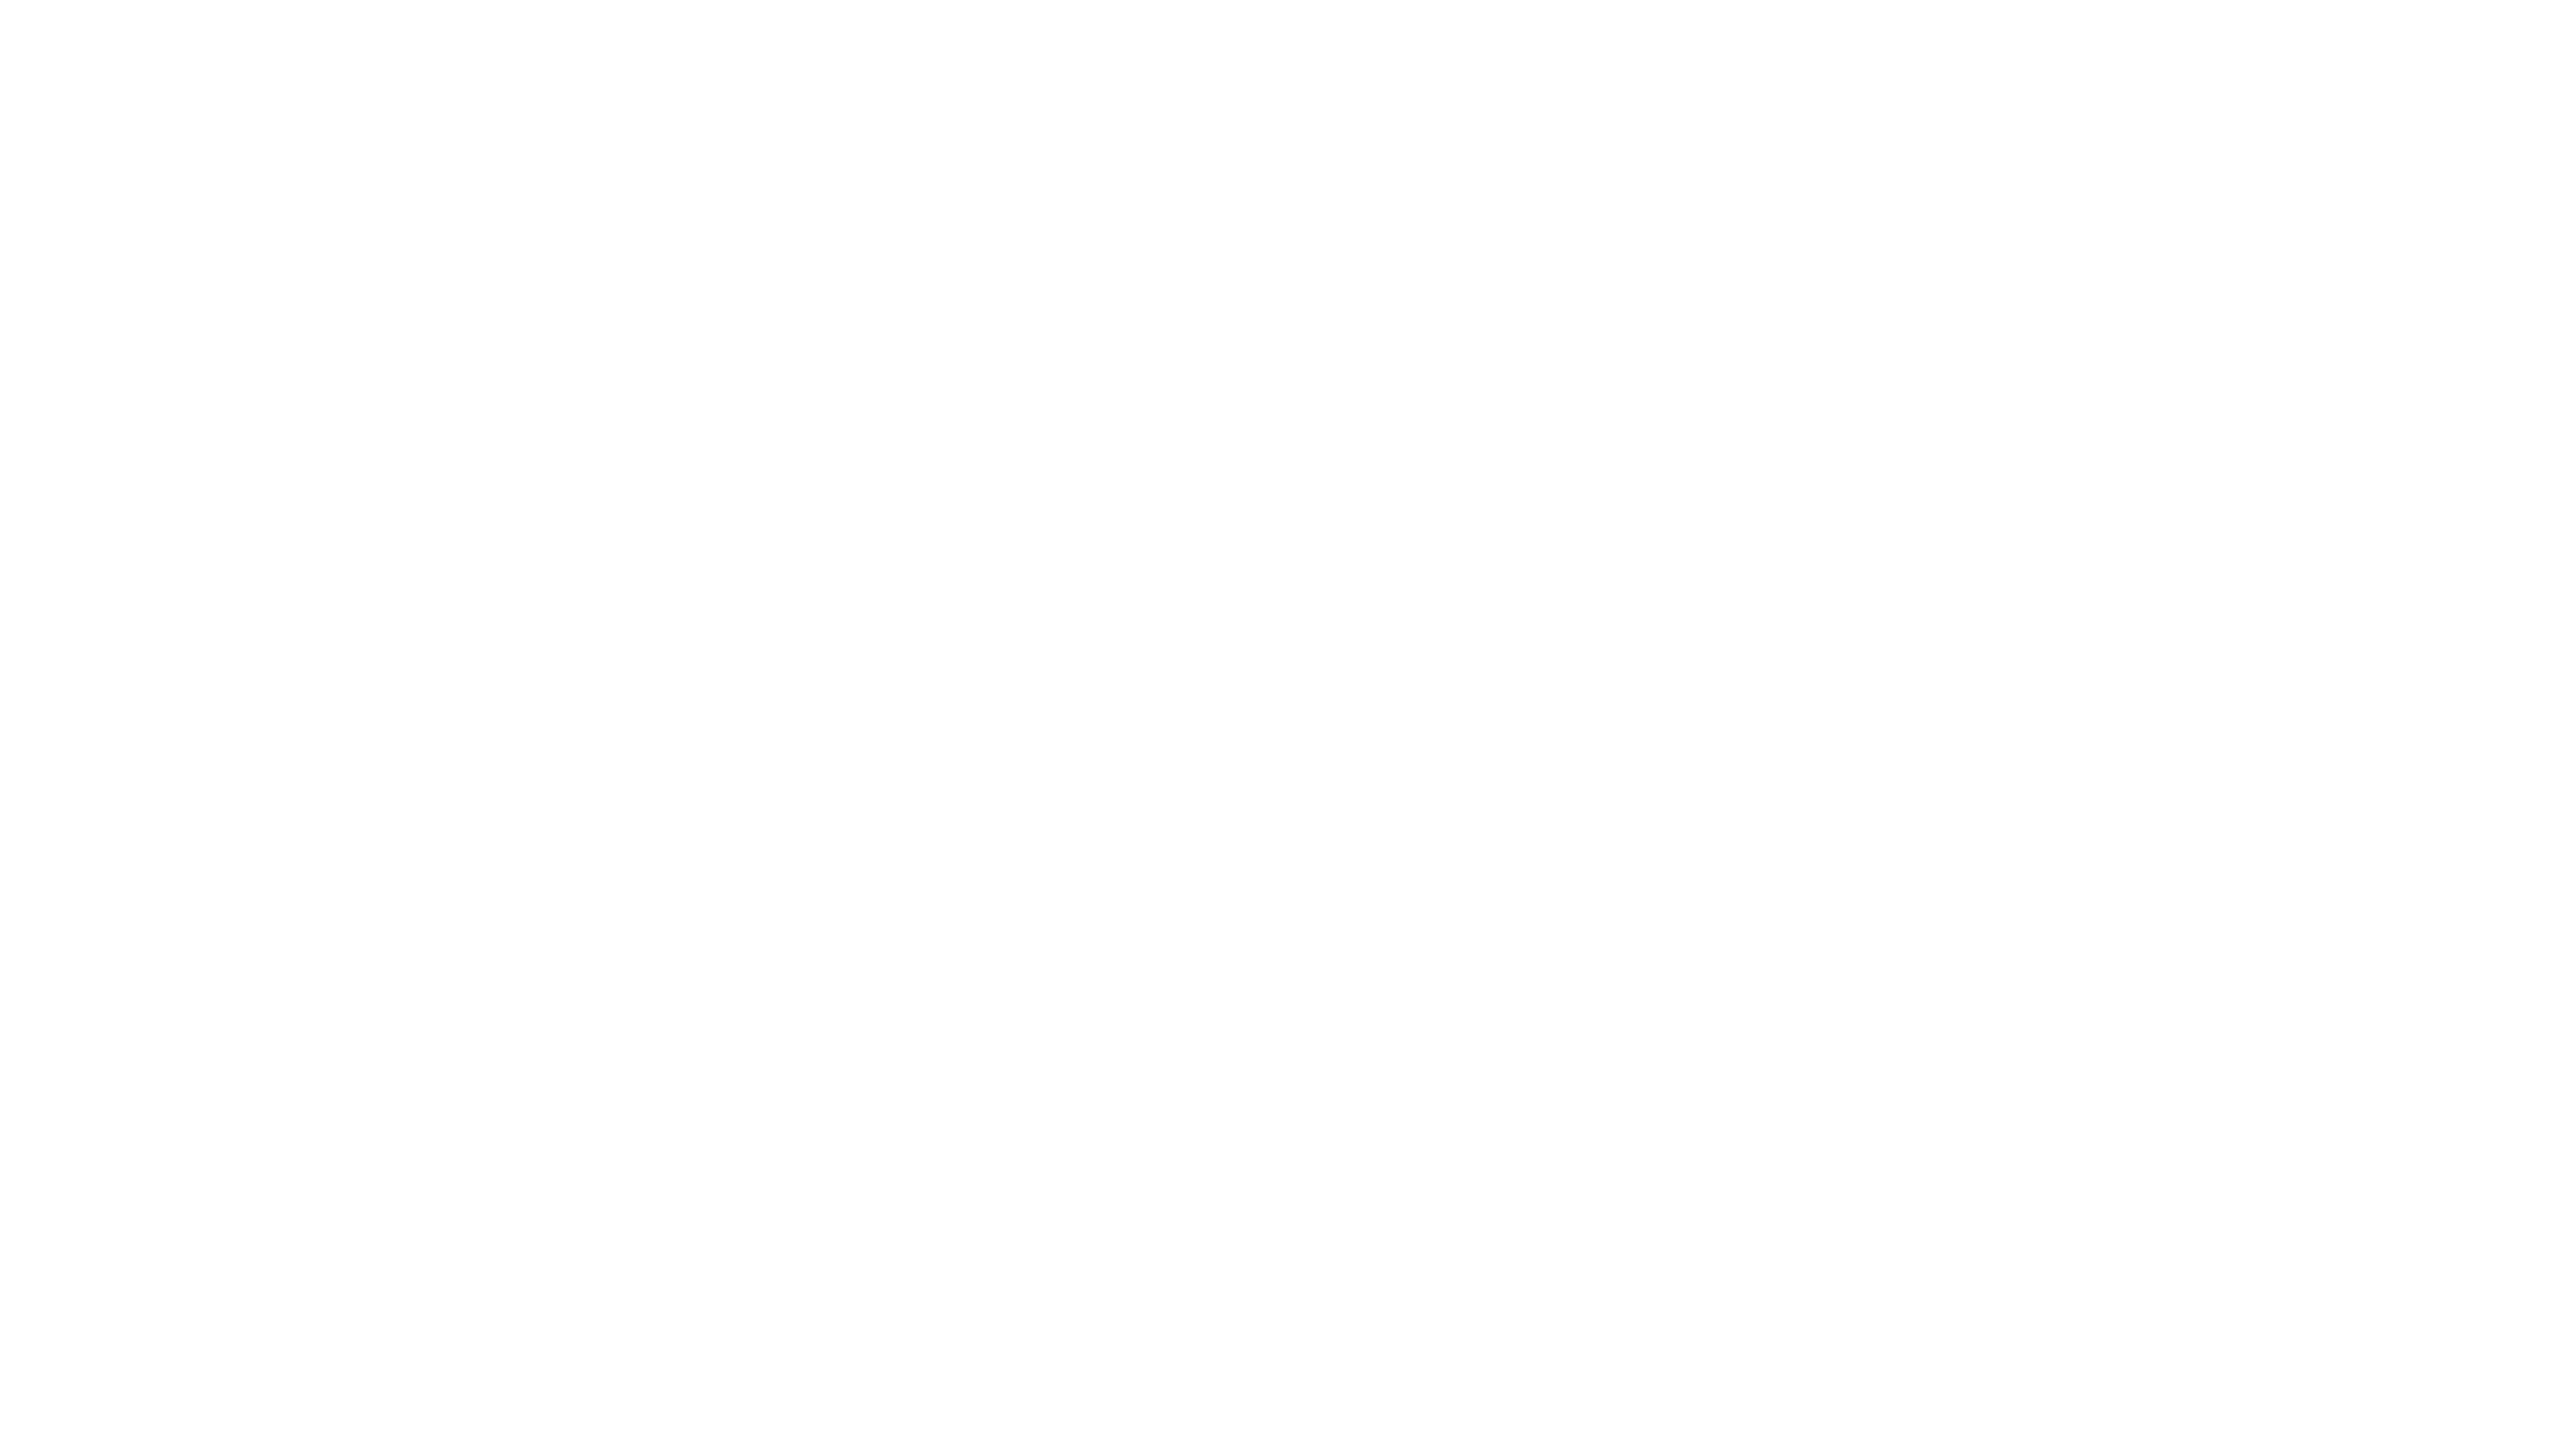 Logo Vodamicro Blanco